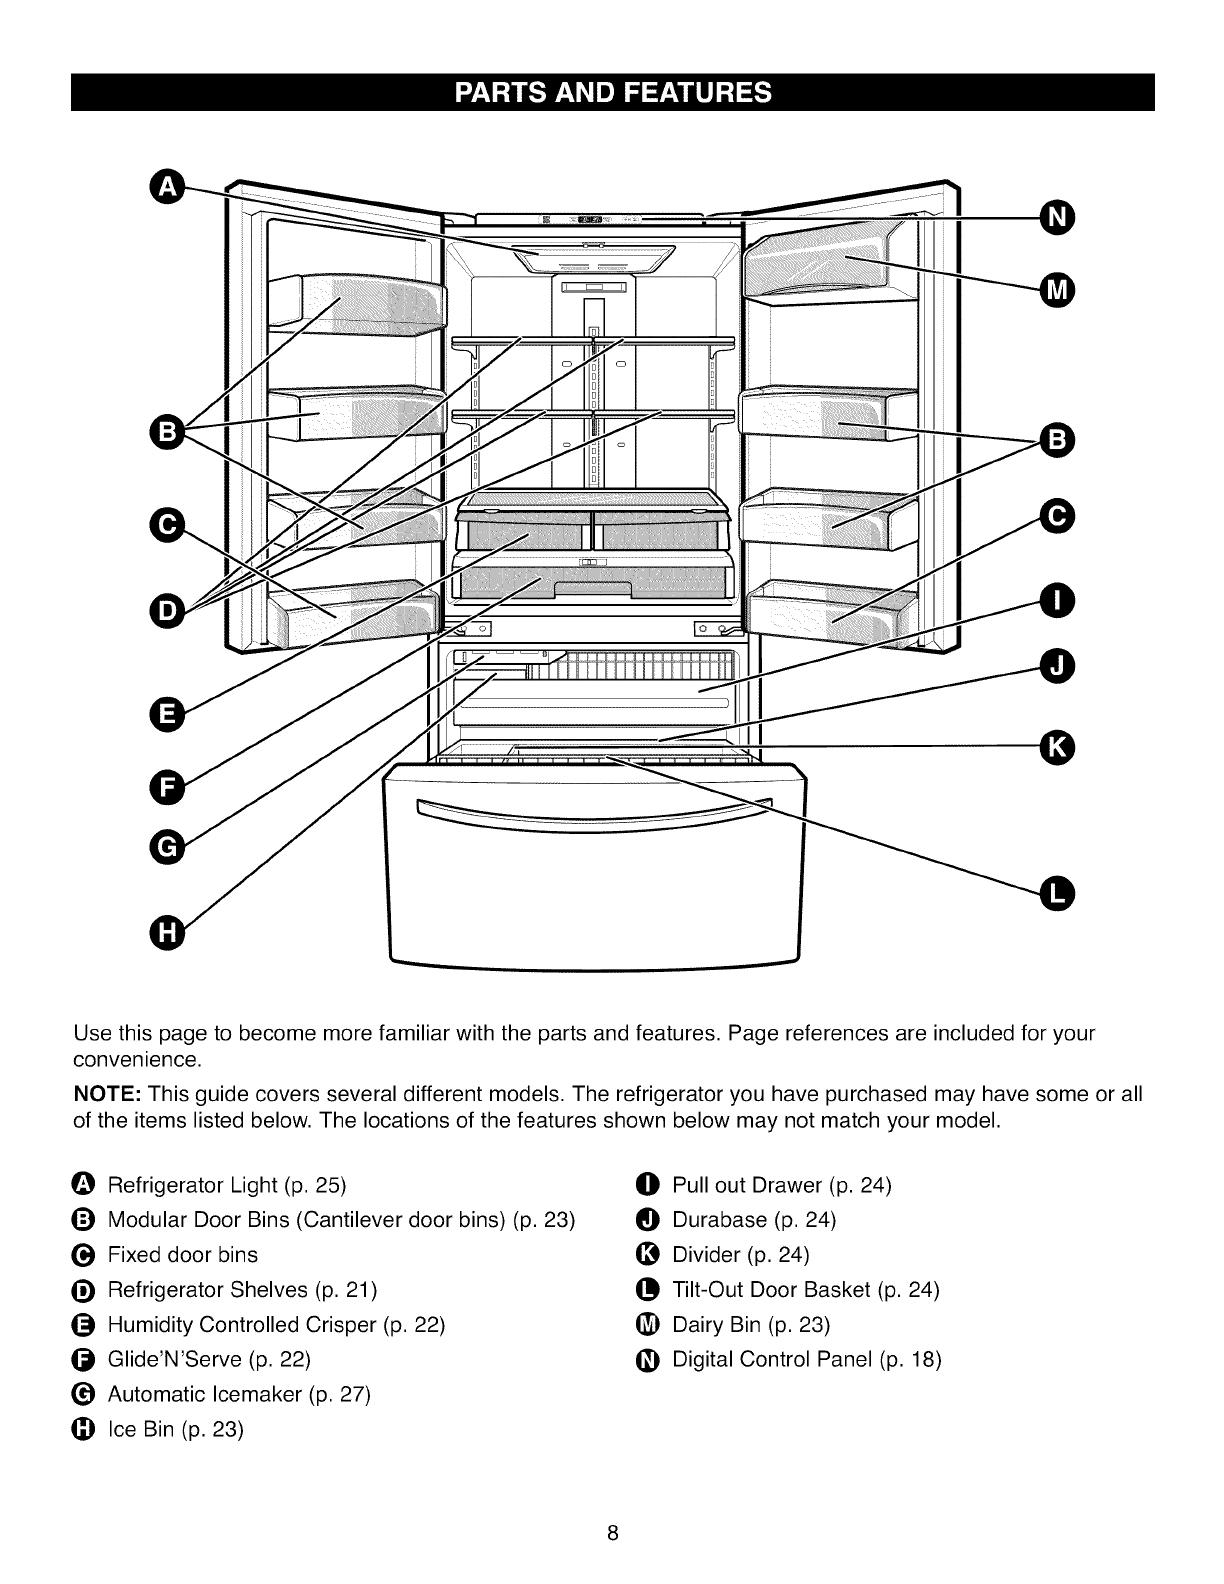 Kenmore User Manual Refrigerator Manuals And